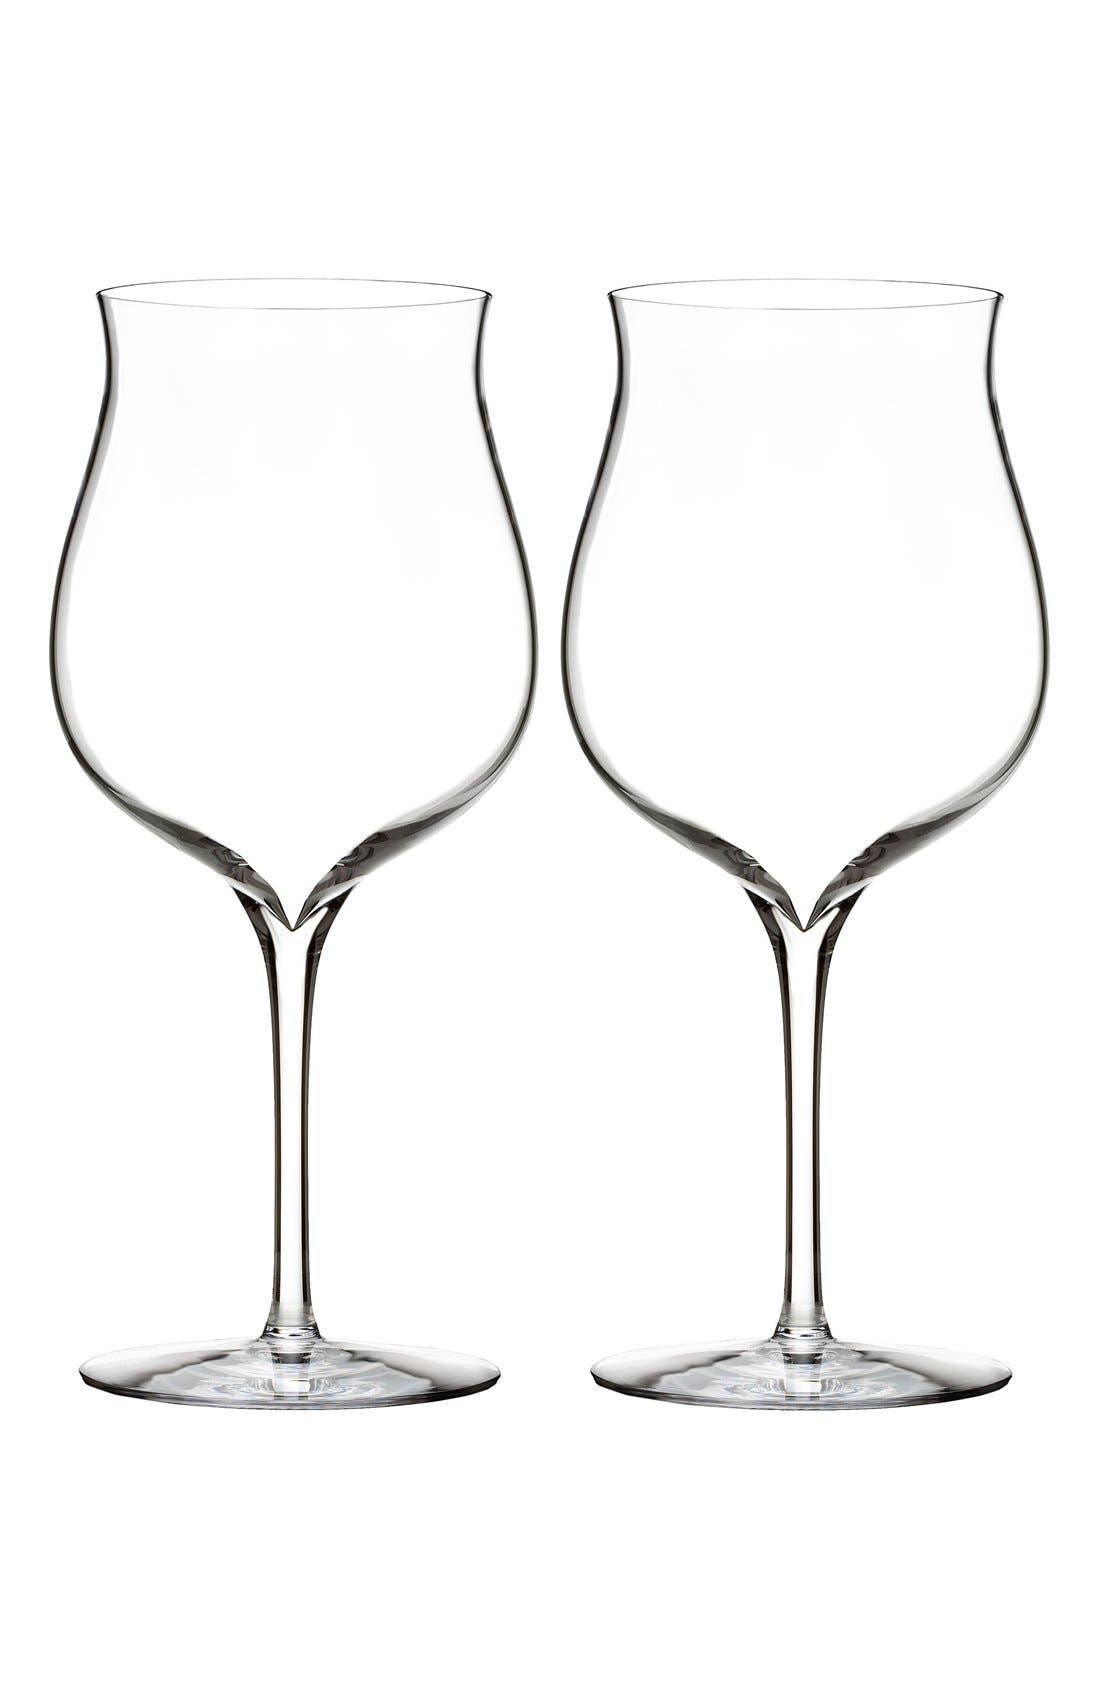 Main Image - Waterford Elegance Set of 2 Fine Crystal Burgundy Wine Glasses